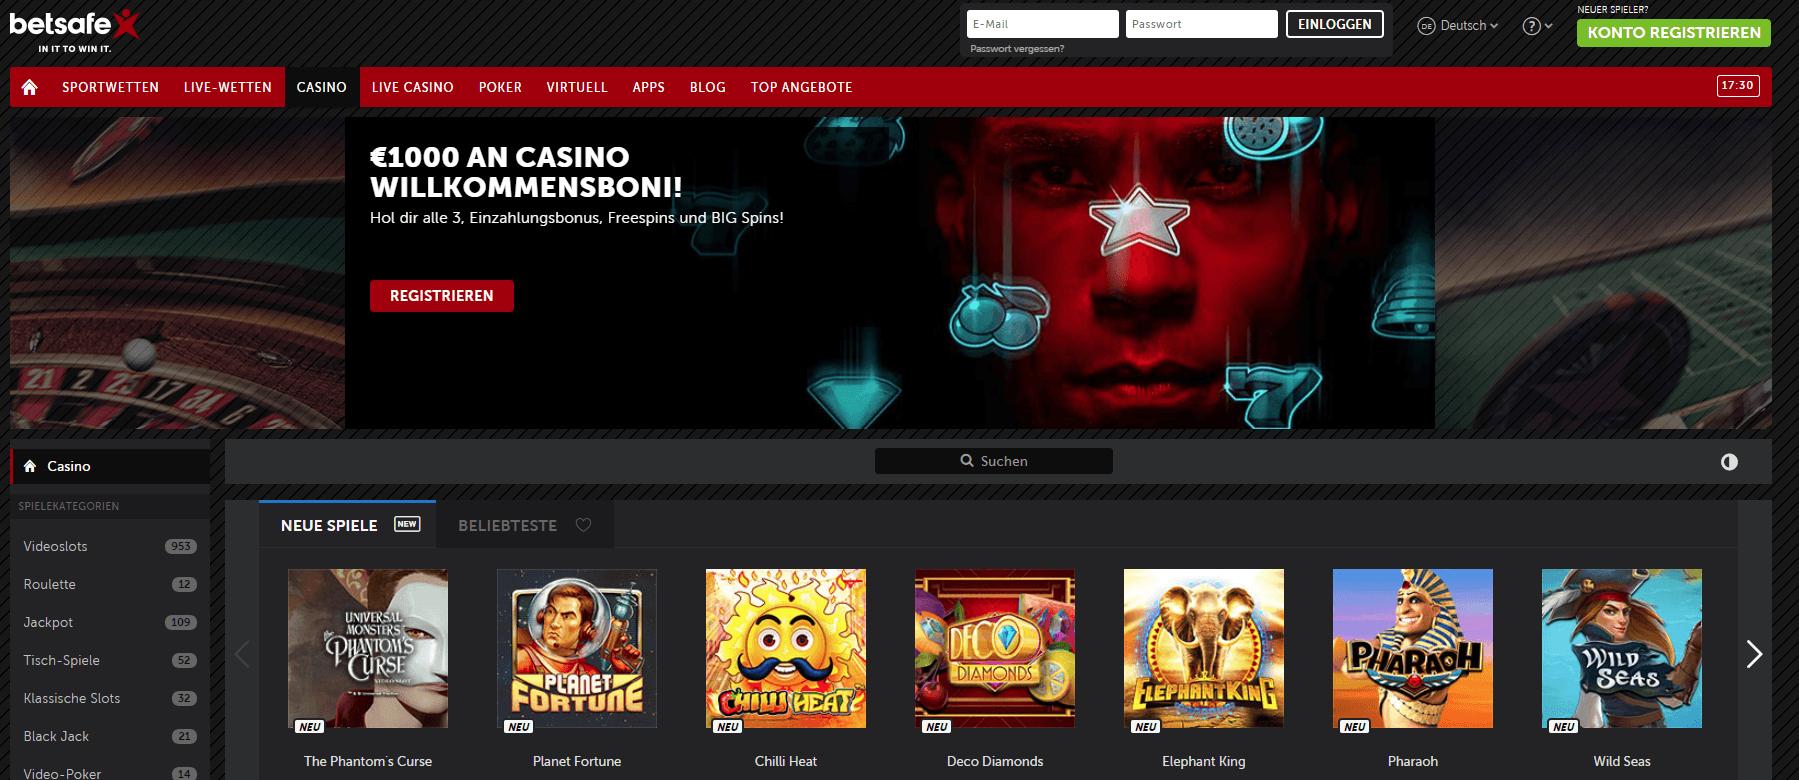 Betsafe Casino Bonuses